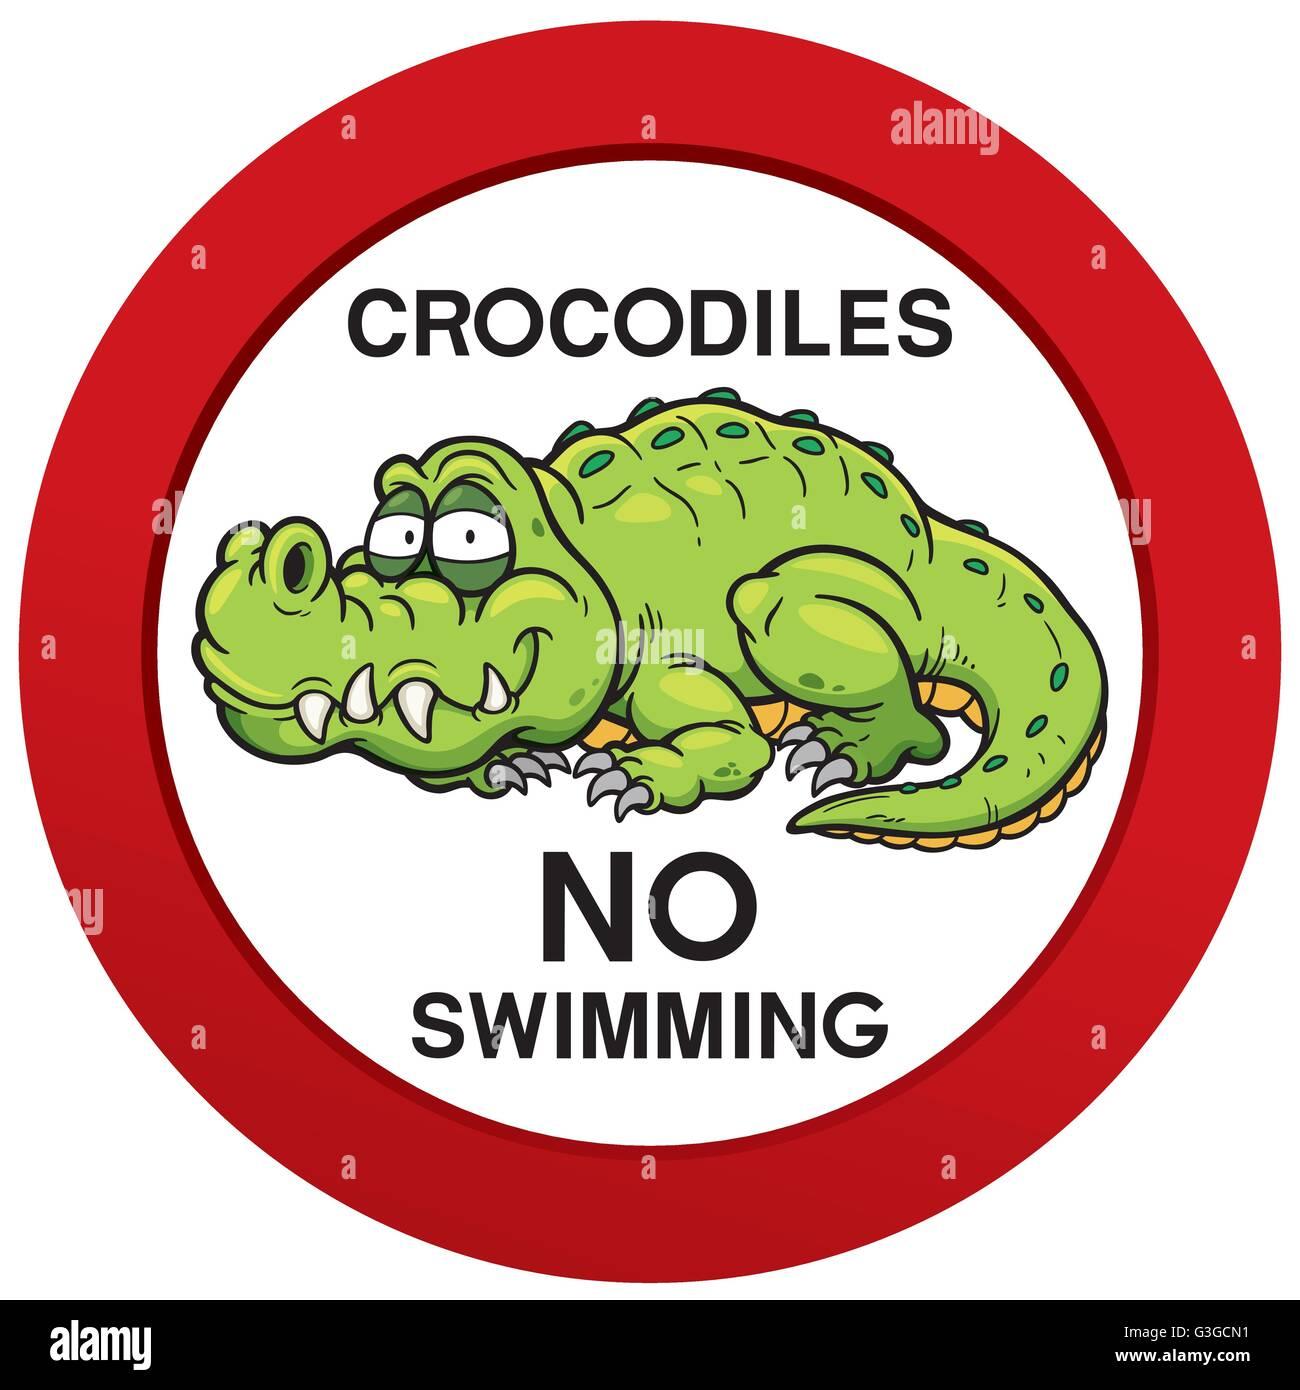 Vector illustration of danger crocodiles no swimming sign - Stock Vector